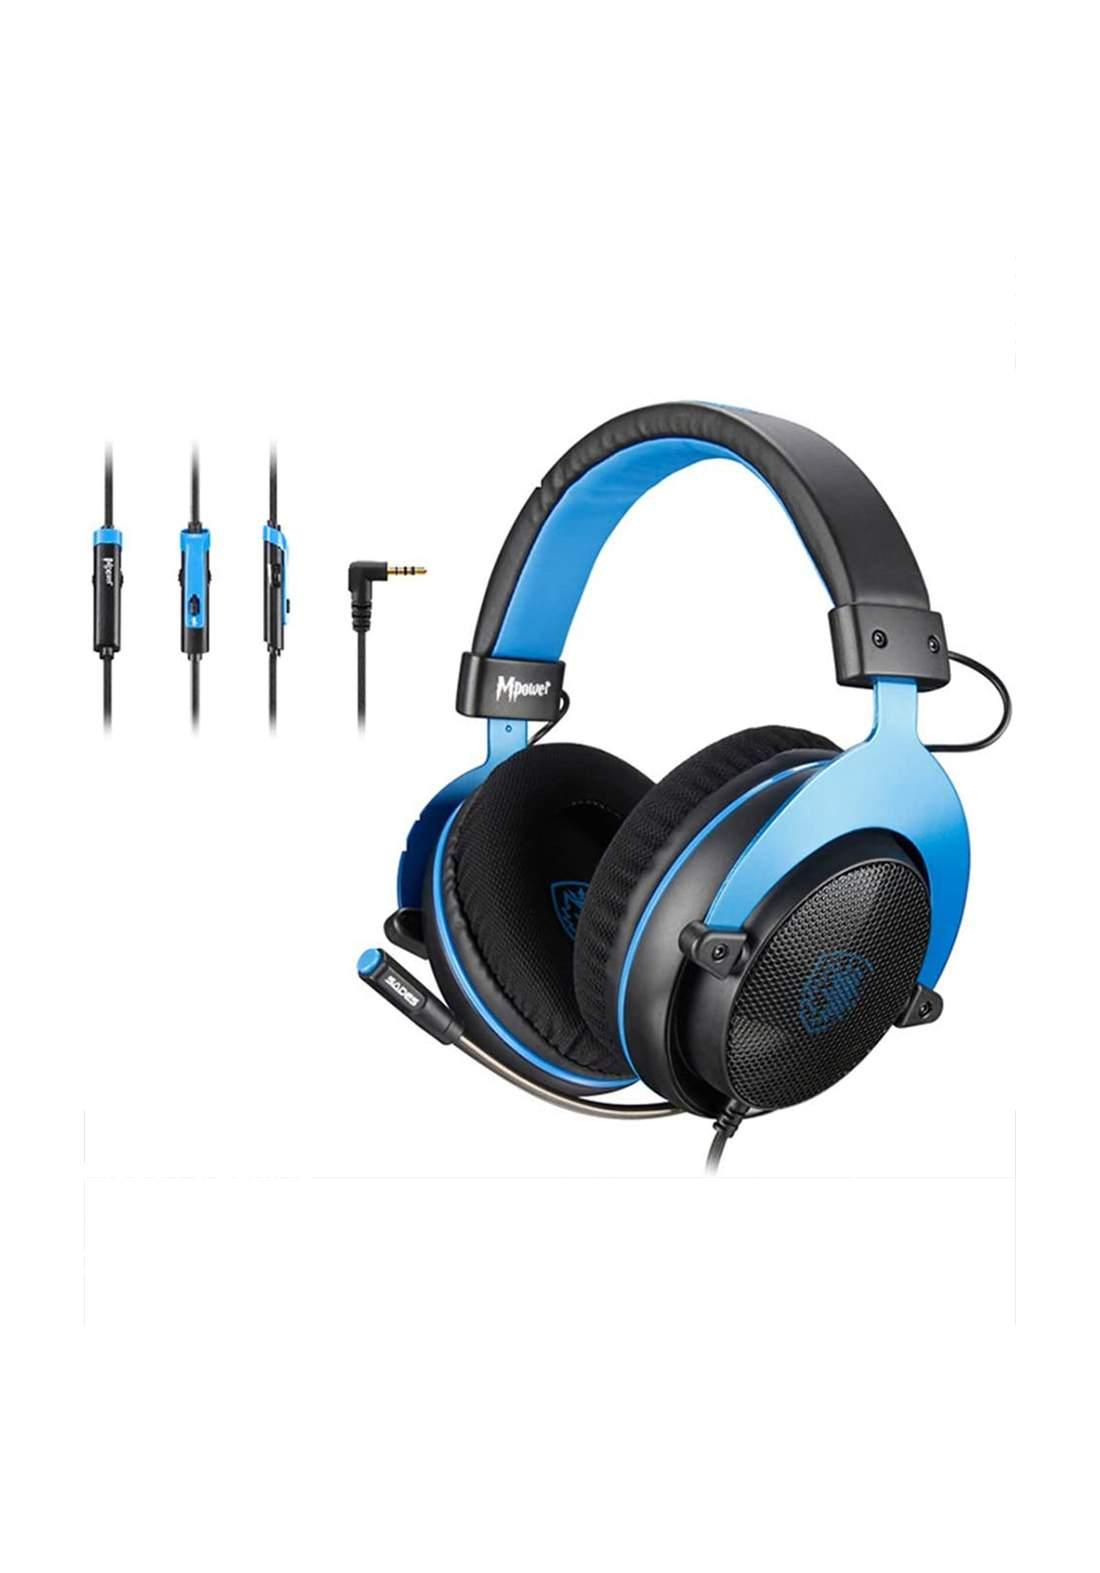 SADES MPOWER Stereo Gaming Headset سماعة سادز صوت ستيريو للألعاب الكمبيوتر